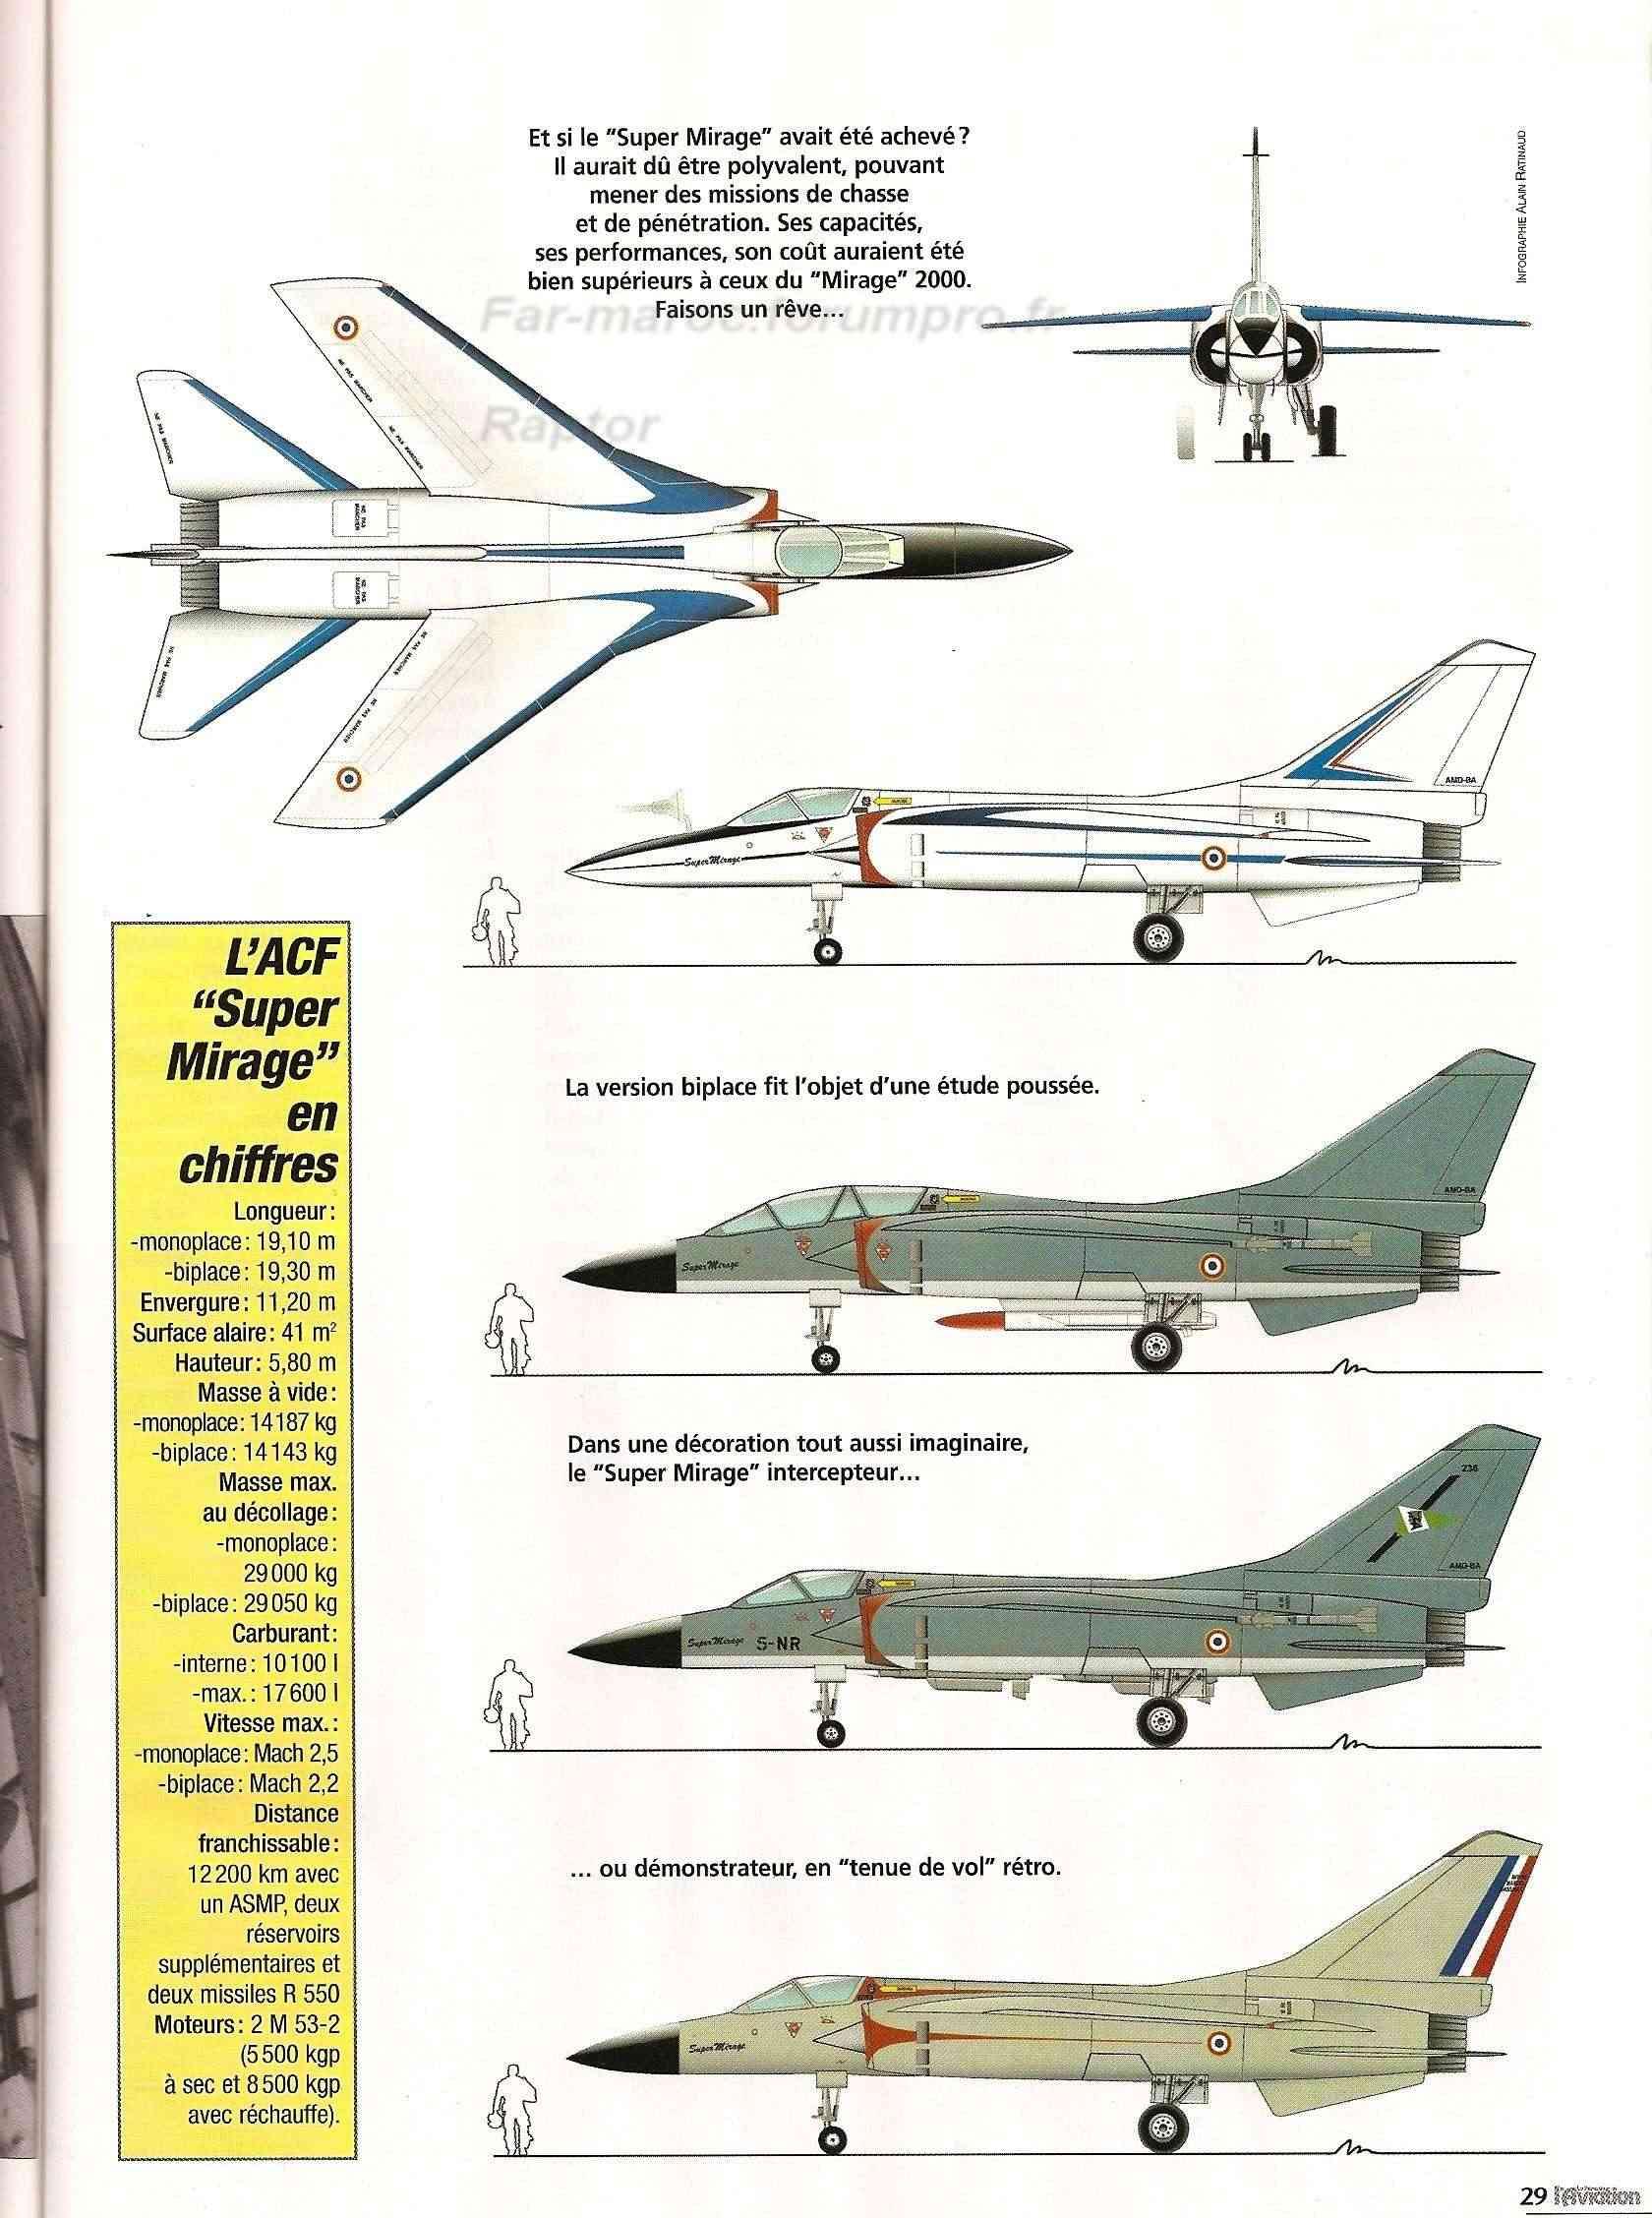 Des avions Dassault peu connus Fana3_10